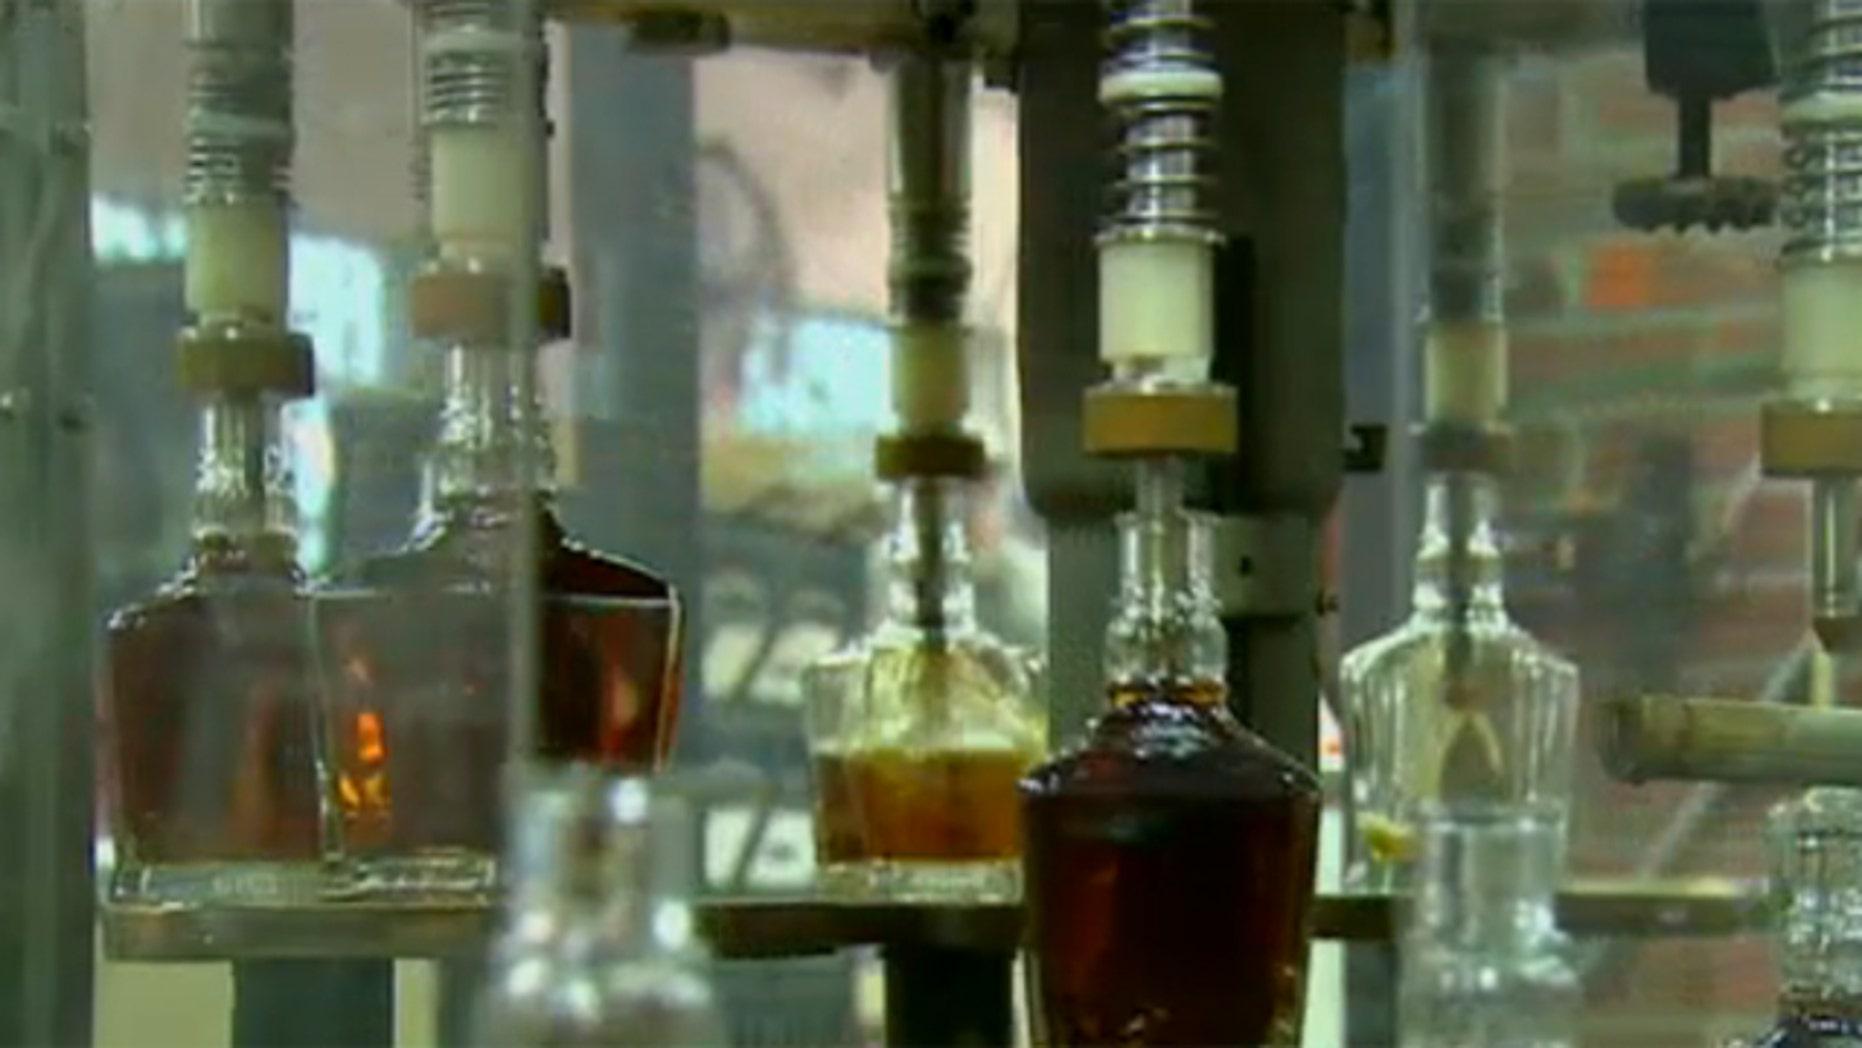 Shown here is the Jack Daniel's distillery in Lynchburg, Tenn.